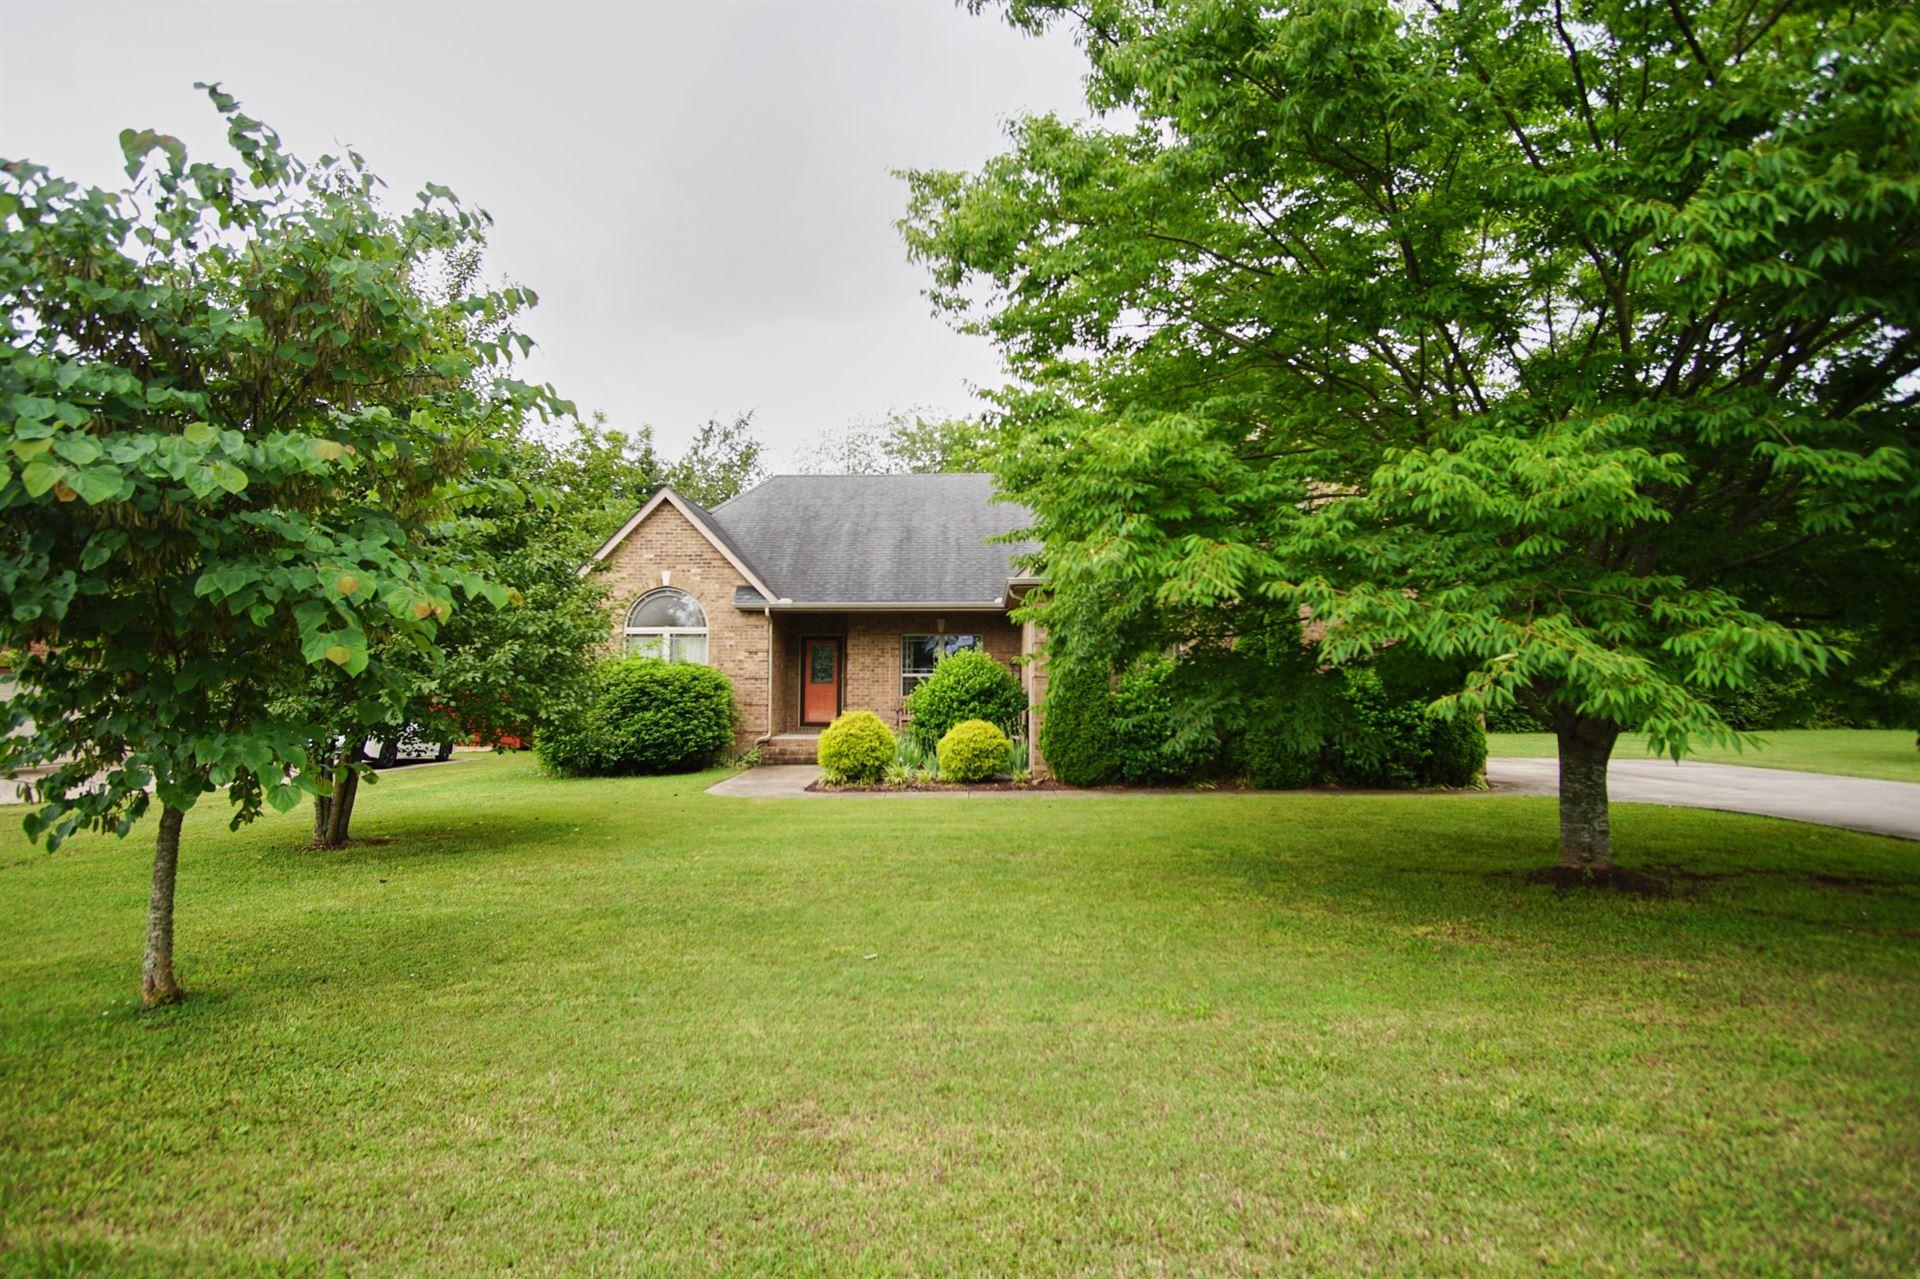 109 Oak Knoll Ct, Murfreesboro, TN 37127 - MLS#: 2261792